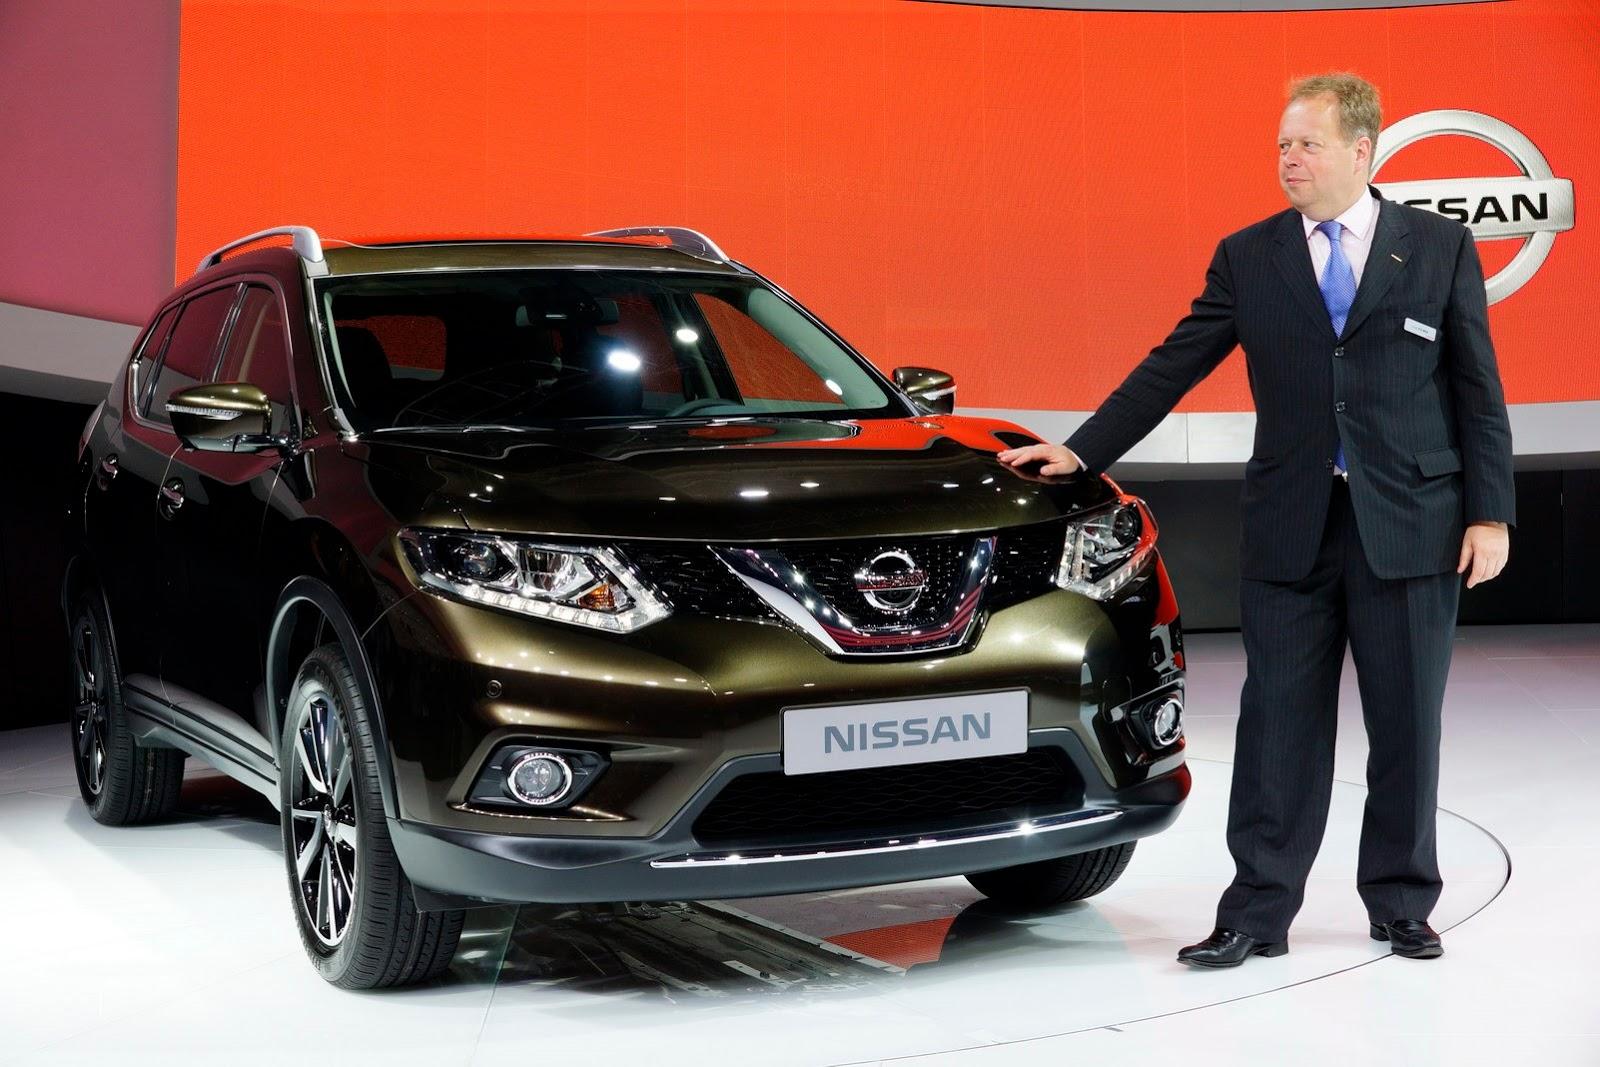 Vroom5000cc: Nissan X-Trail 2014: New Excitement